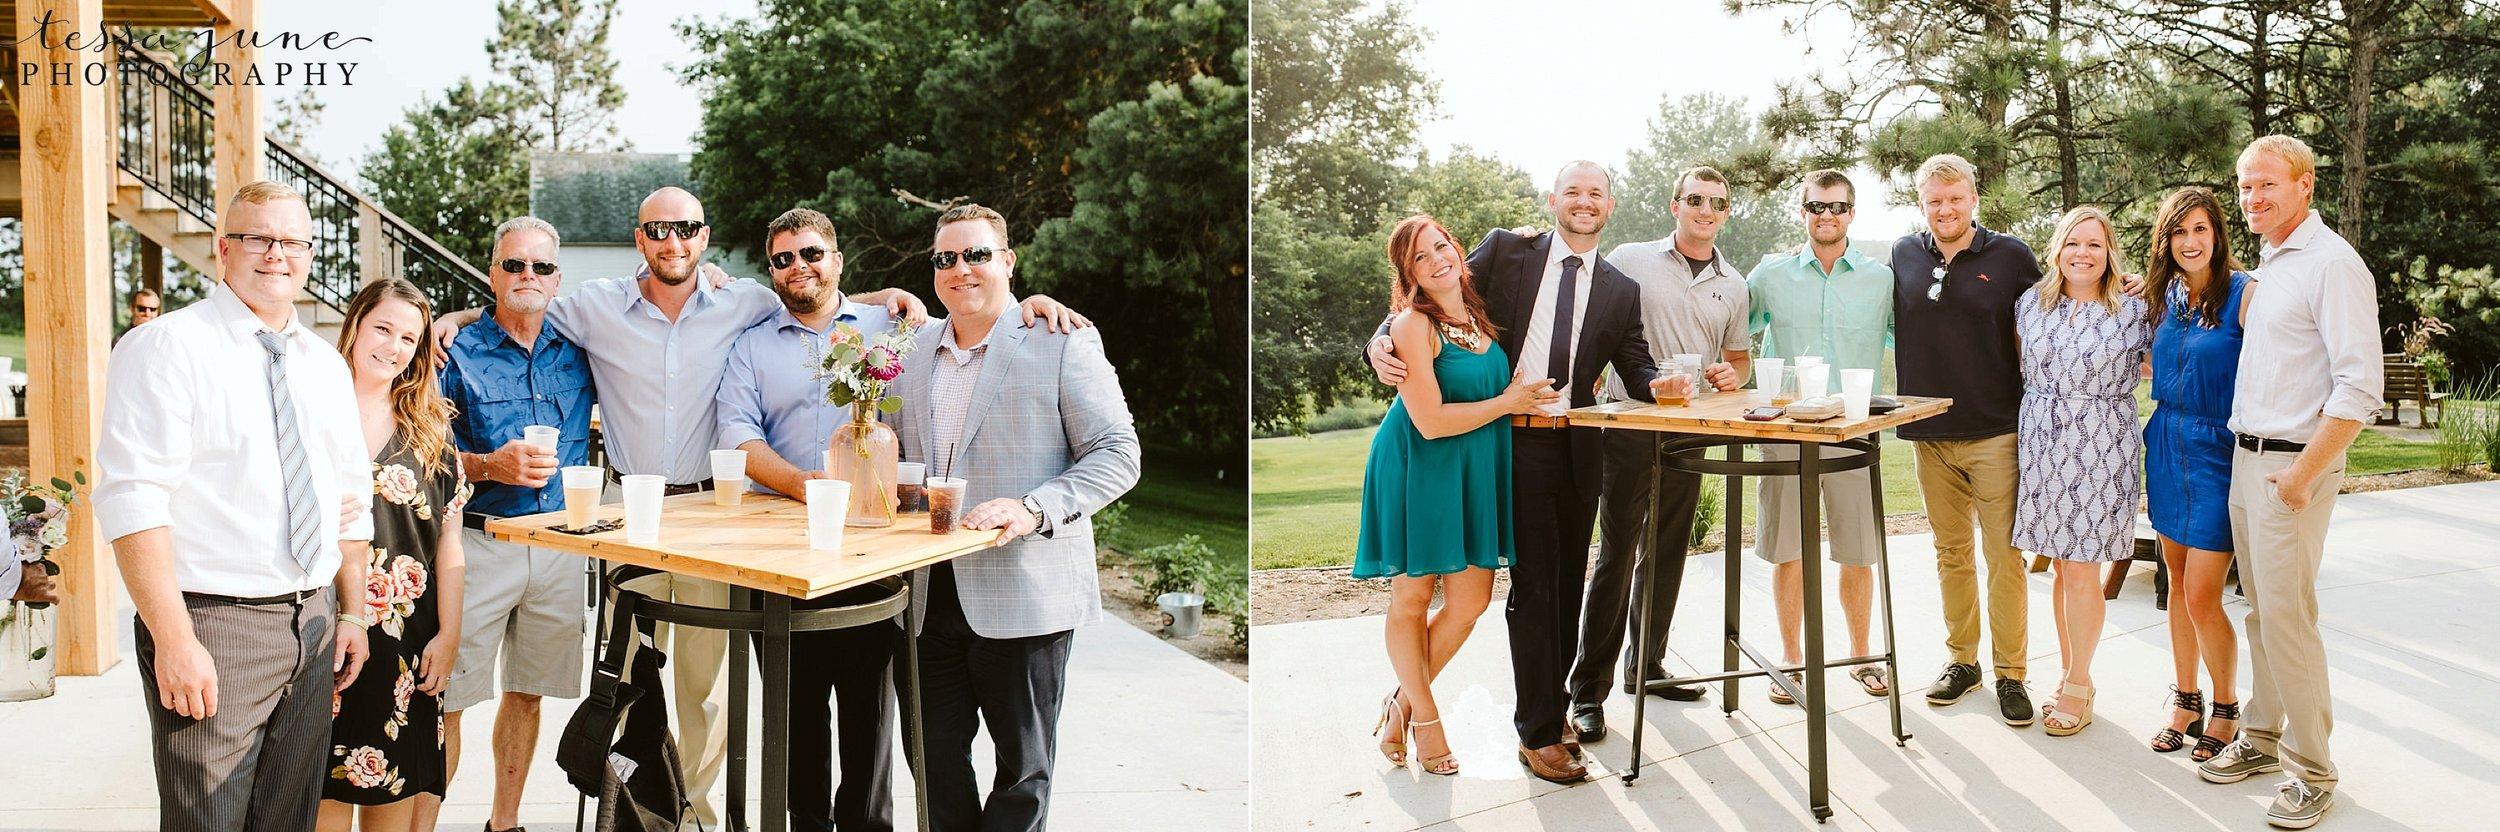 gathered-oaks-barn-wedding-alexandria-minnesota-153.jpg